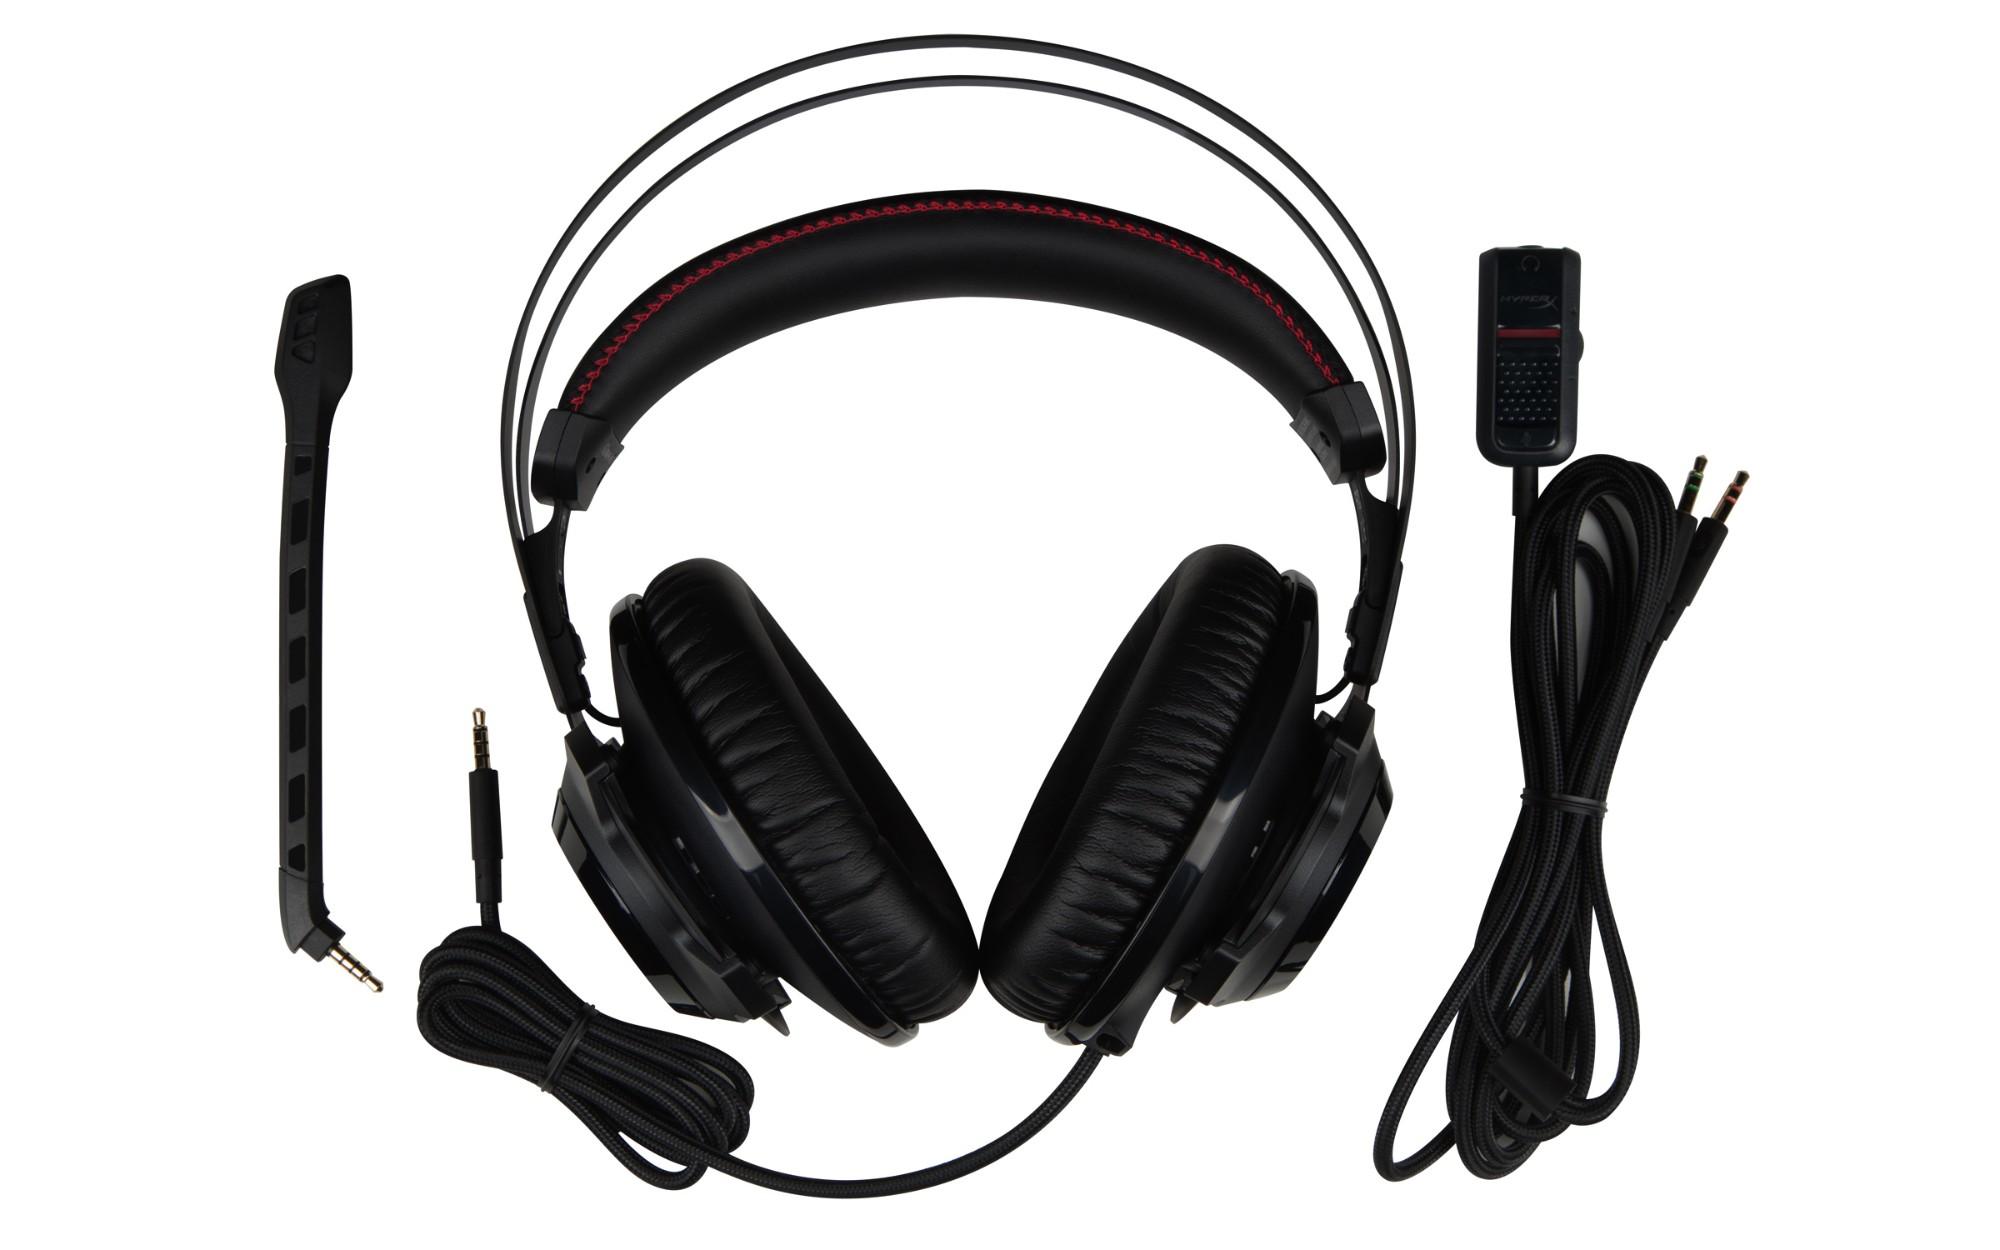 HyperX Cloud Revolver headset